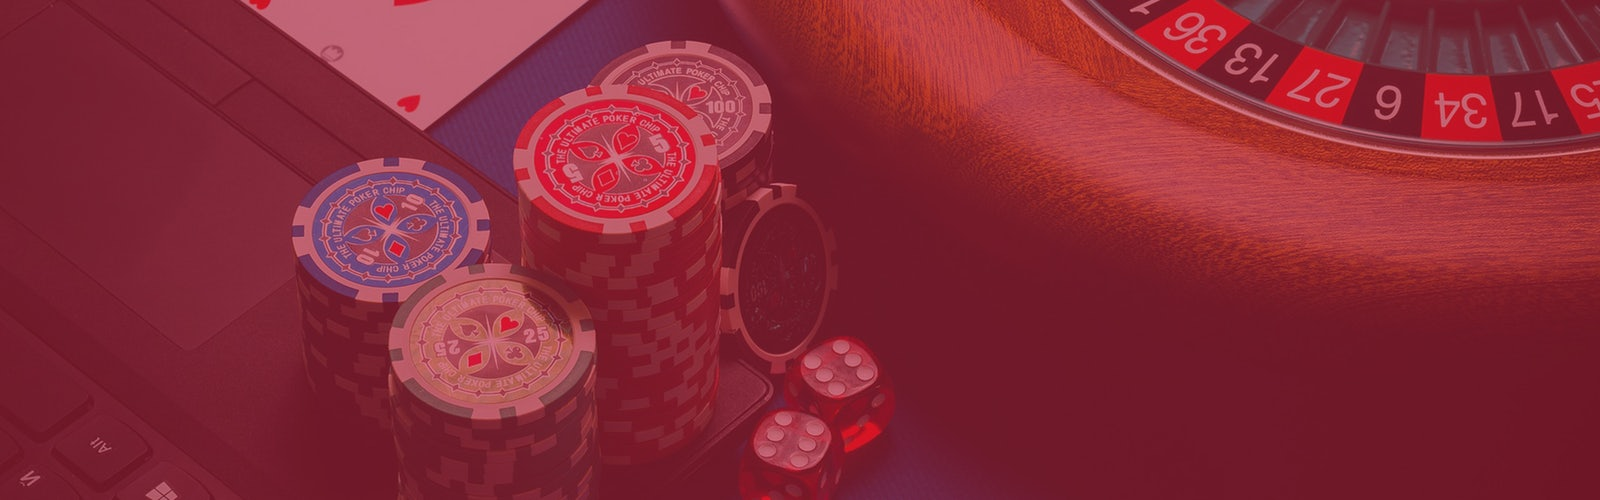 Casino online banner